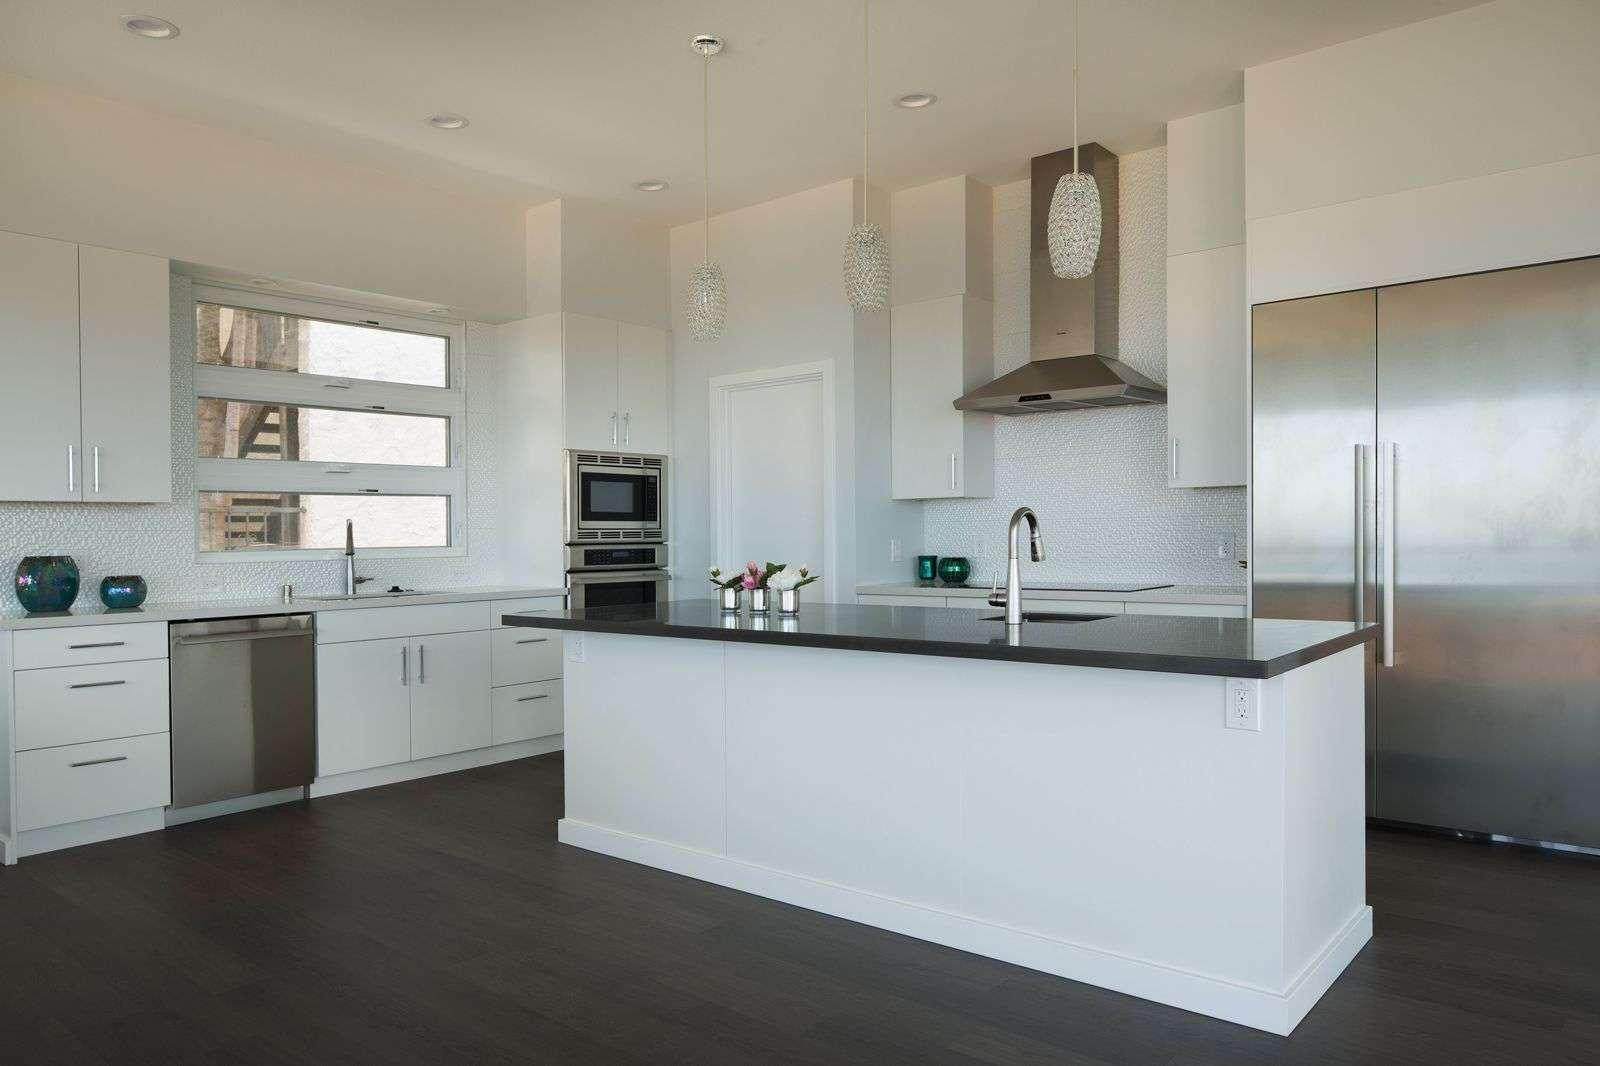 Doma Residence | Honolulu Design Build Contractor